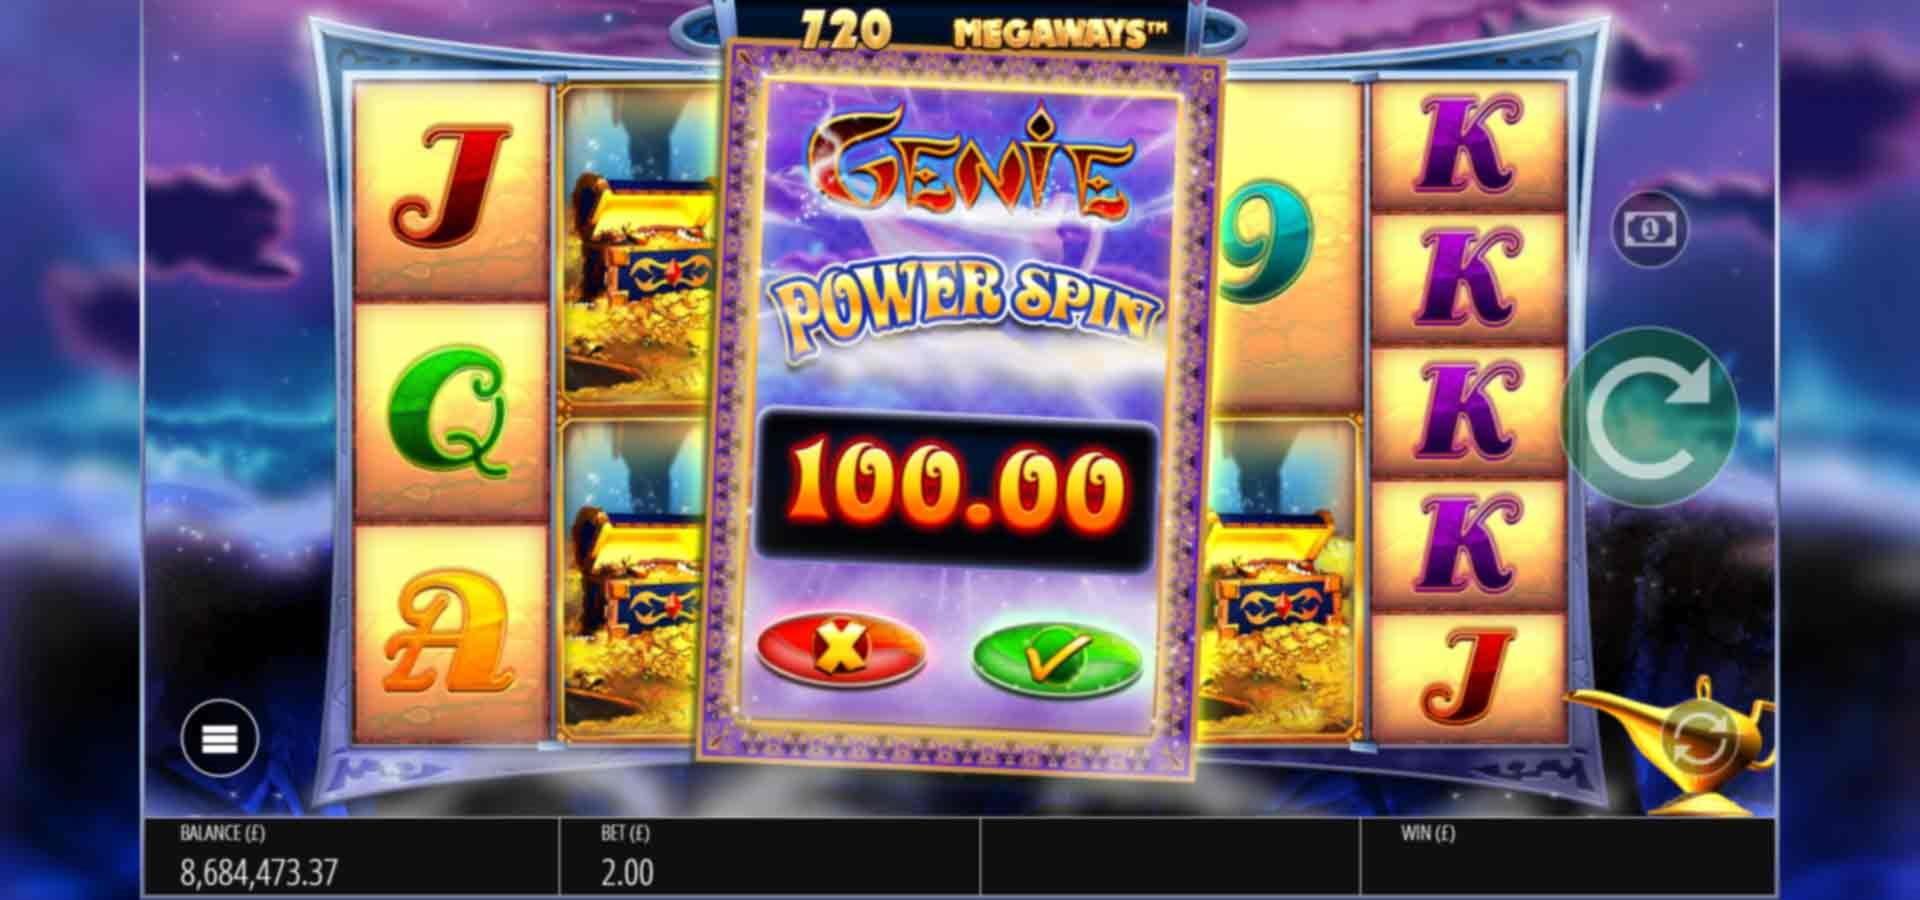 $230 Free casino chip at Magic Red Casino